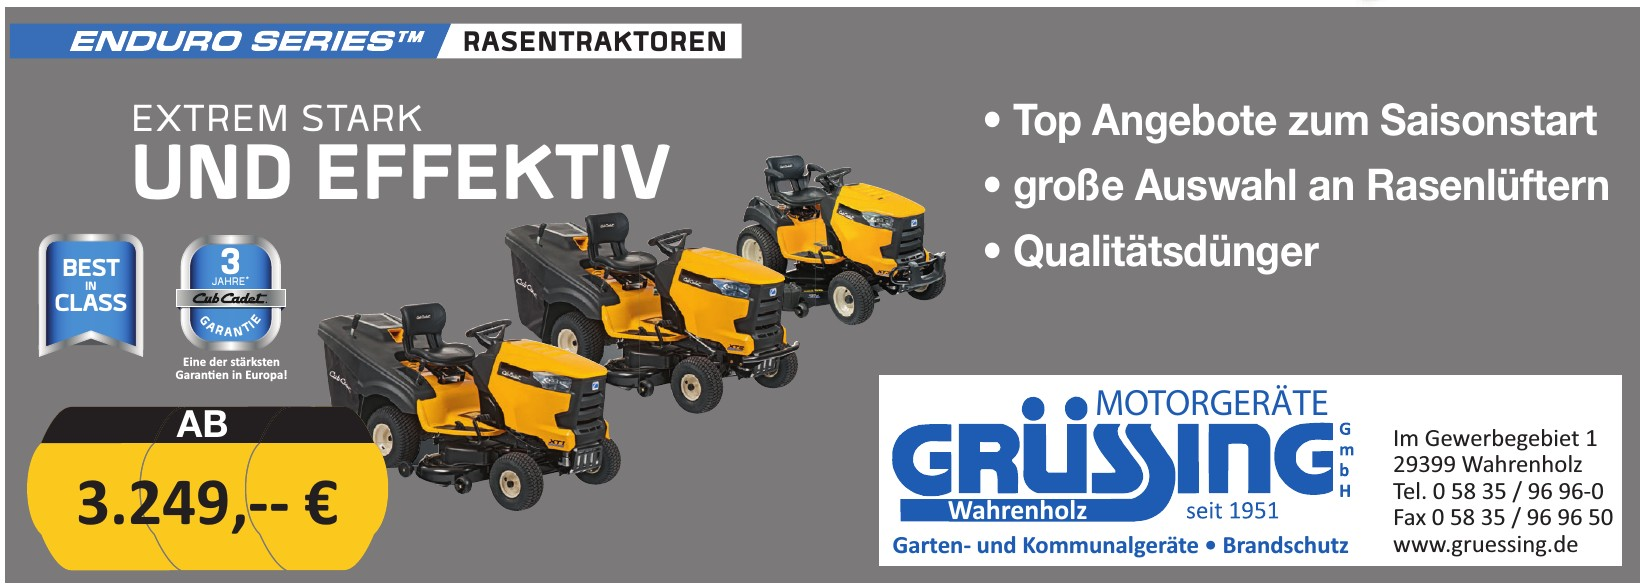 Grüssing Motorgeräte GmbH